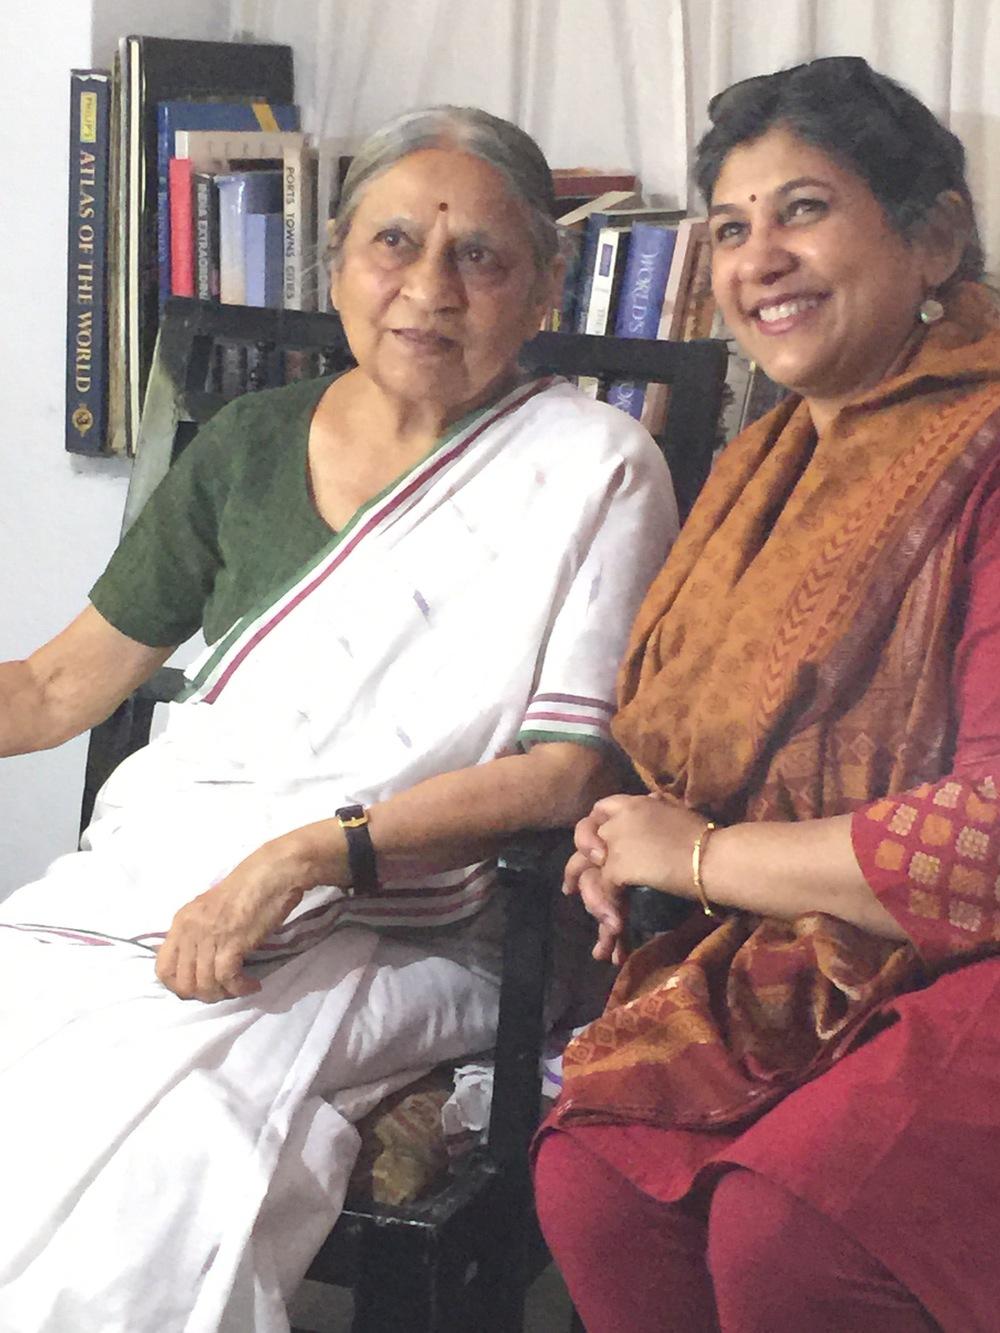 Ela Bhatt, Rekha Puri - March 2015 #LINEed